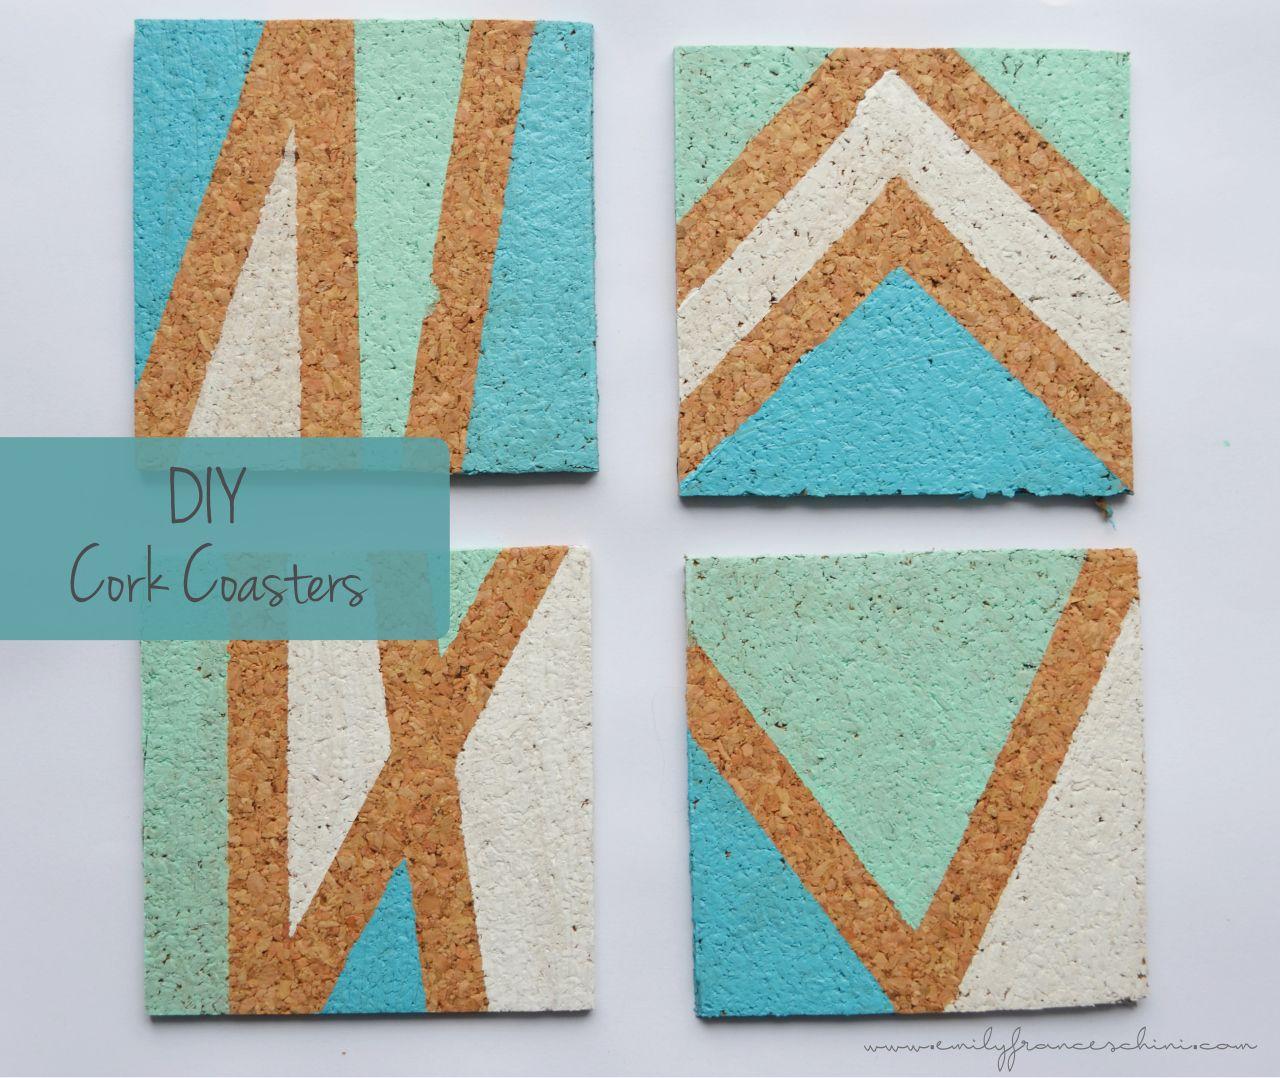 Diy easy painted cork coasters craft diy pinterest for Simple cork